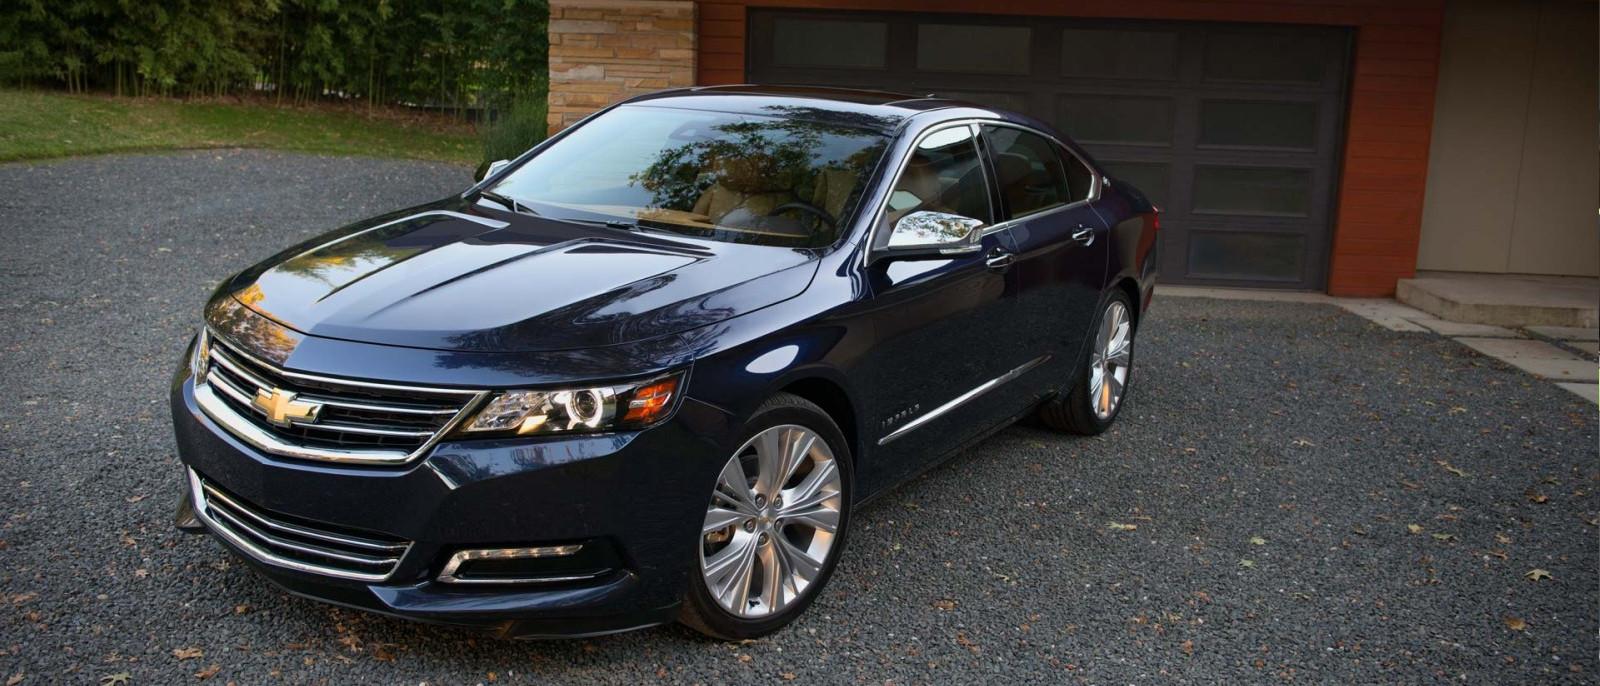 Impala-white